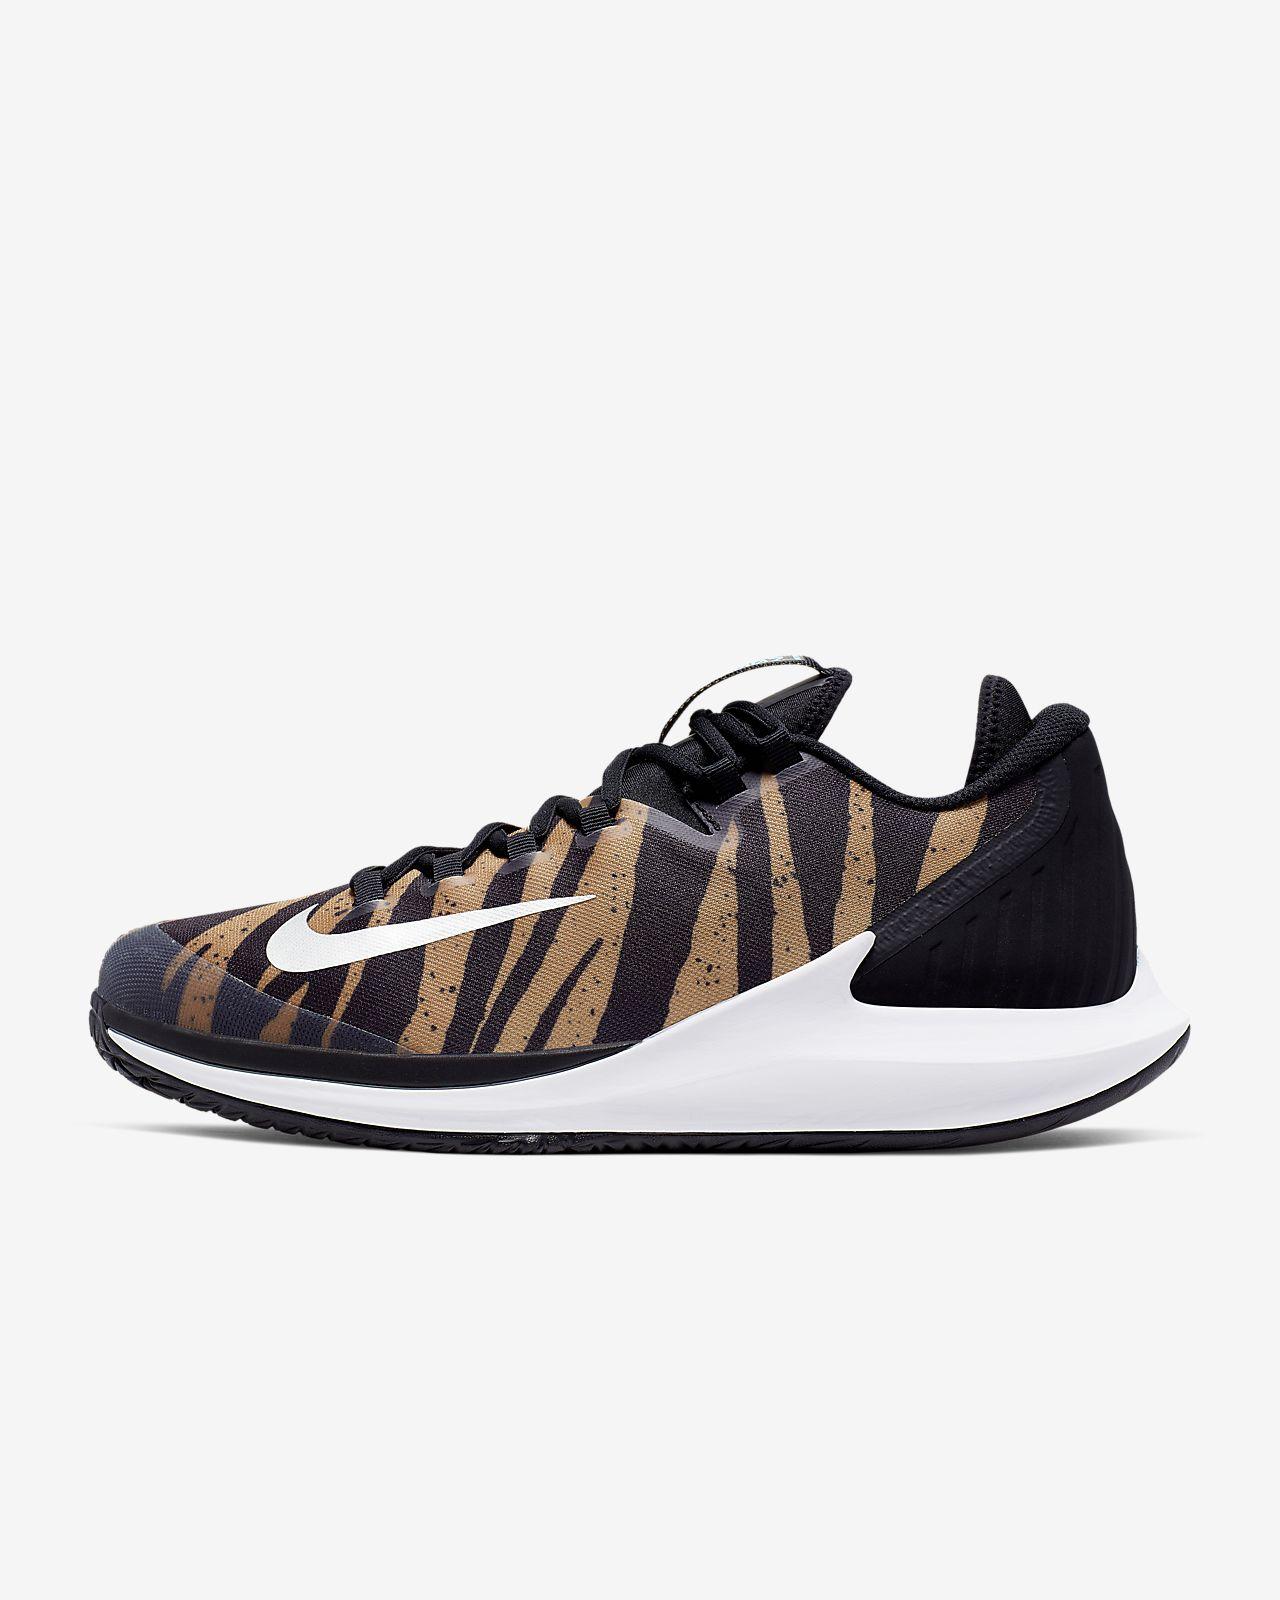 Pánská tenisová bota NikeCourt Air Zoom Zero